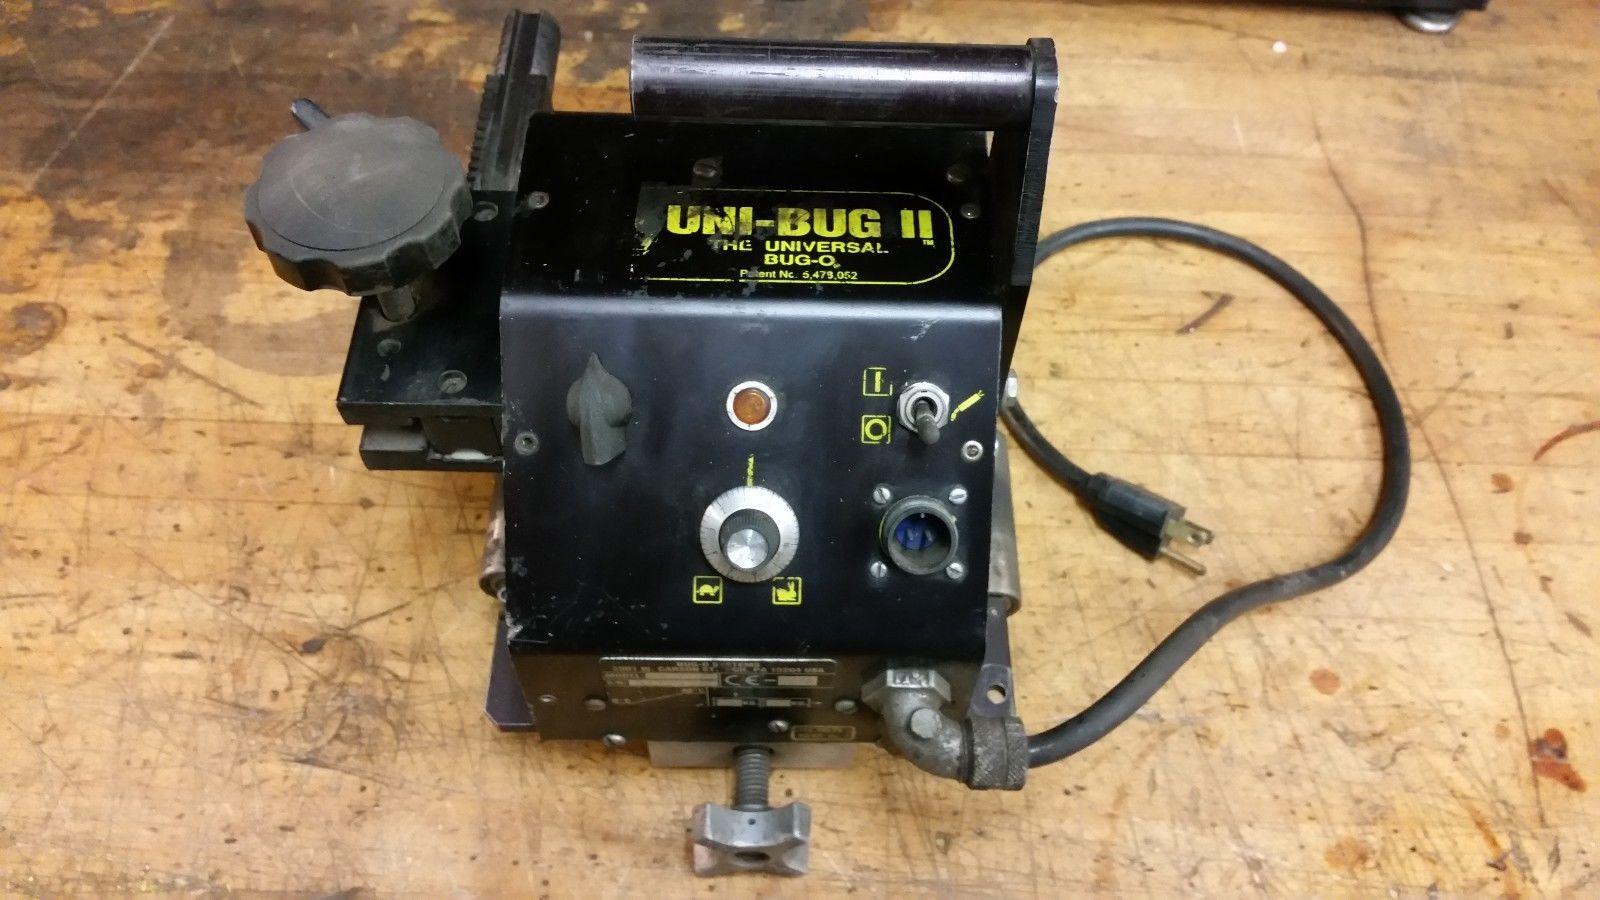 Bug-o Uni-Bug II mig welding track tractor motorized torch carrier robot